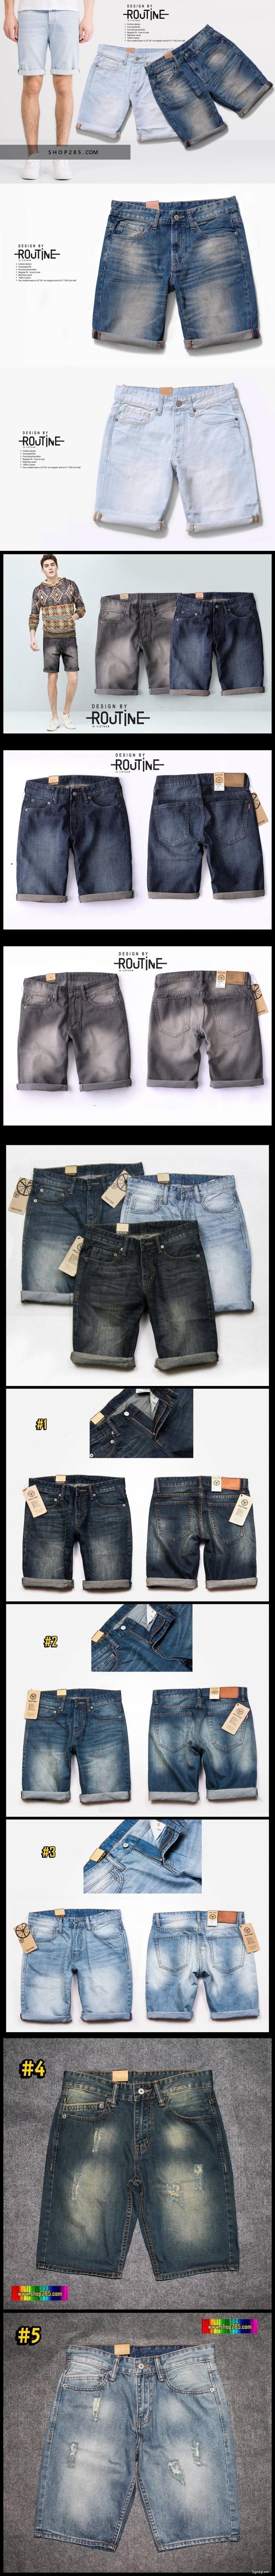 Shop285.com - Shop quần áo : Zara,Jules,Jake*s,,Hollister,Aber,CK,Tommy,Levis - 16